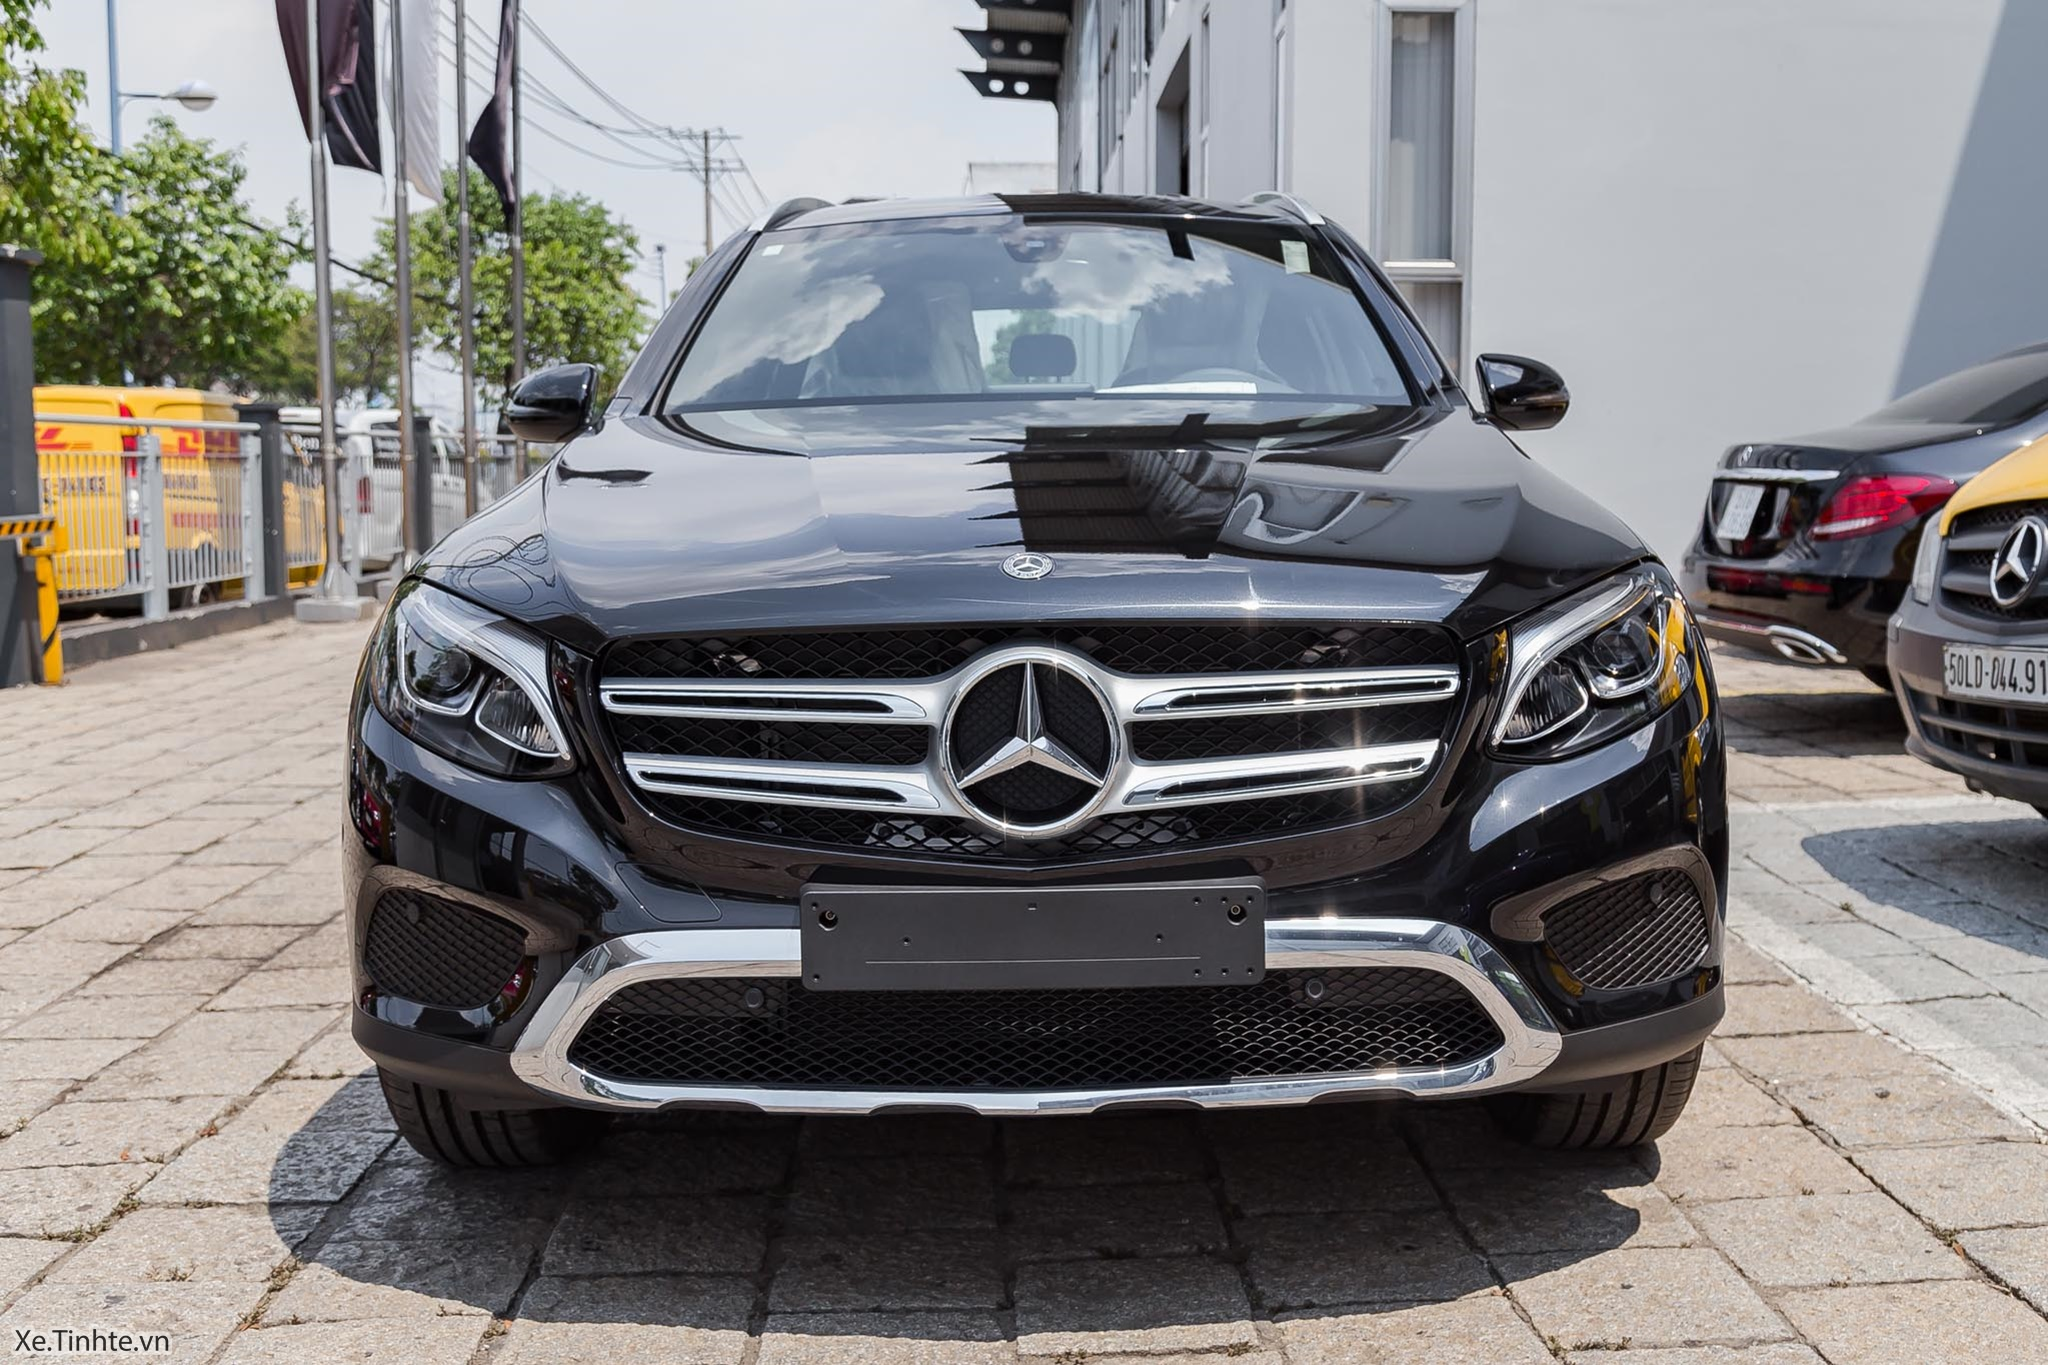 Mercedes_Benz_GLC_Class_2018_Xe_Tinhte-IMG_0750.jpg